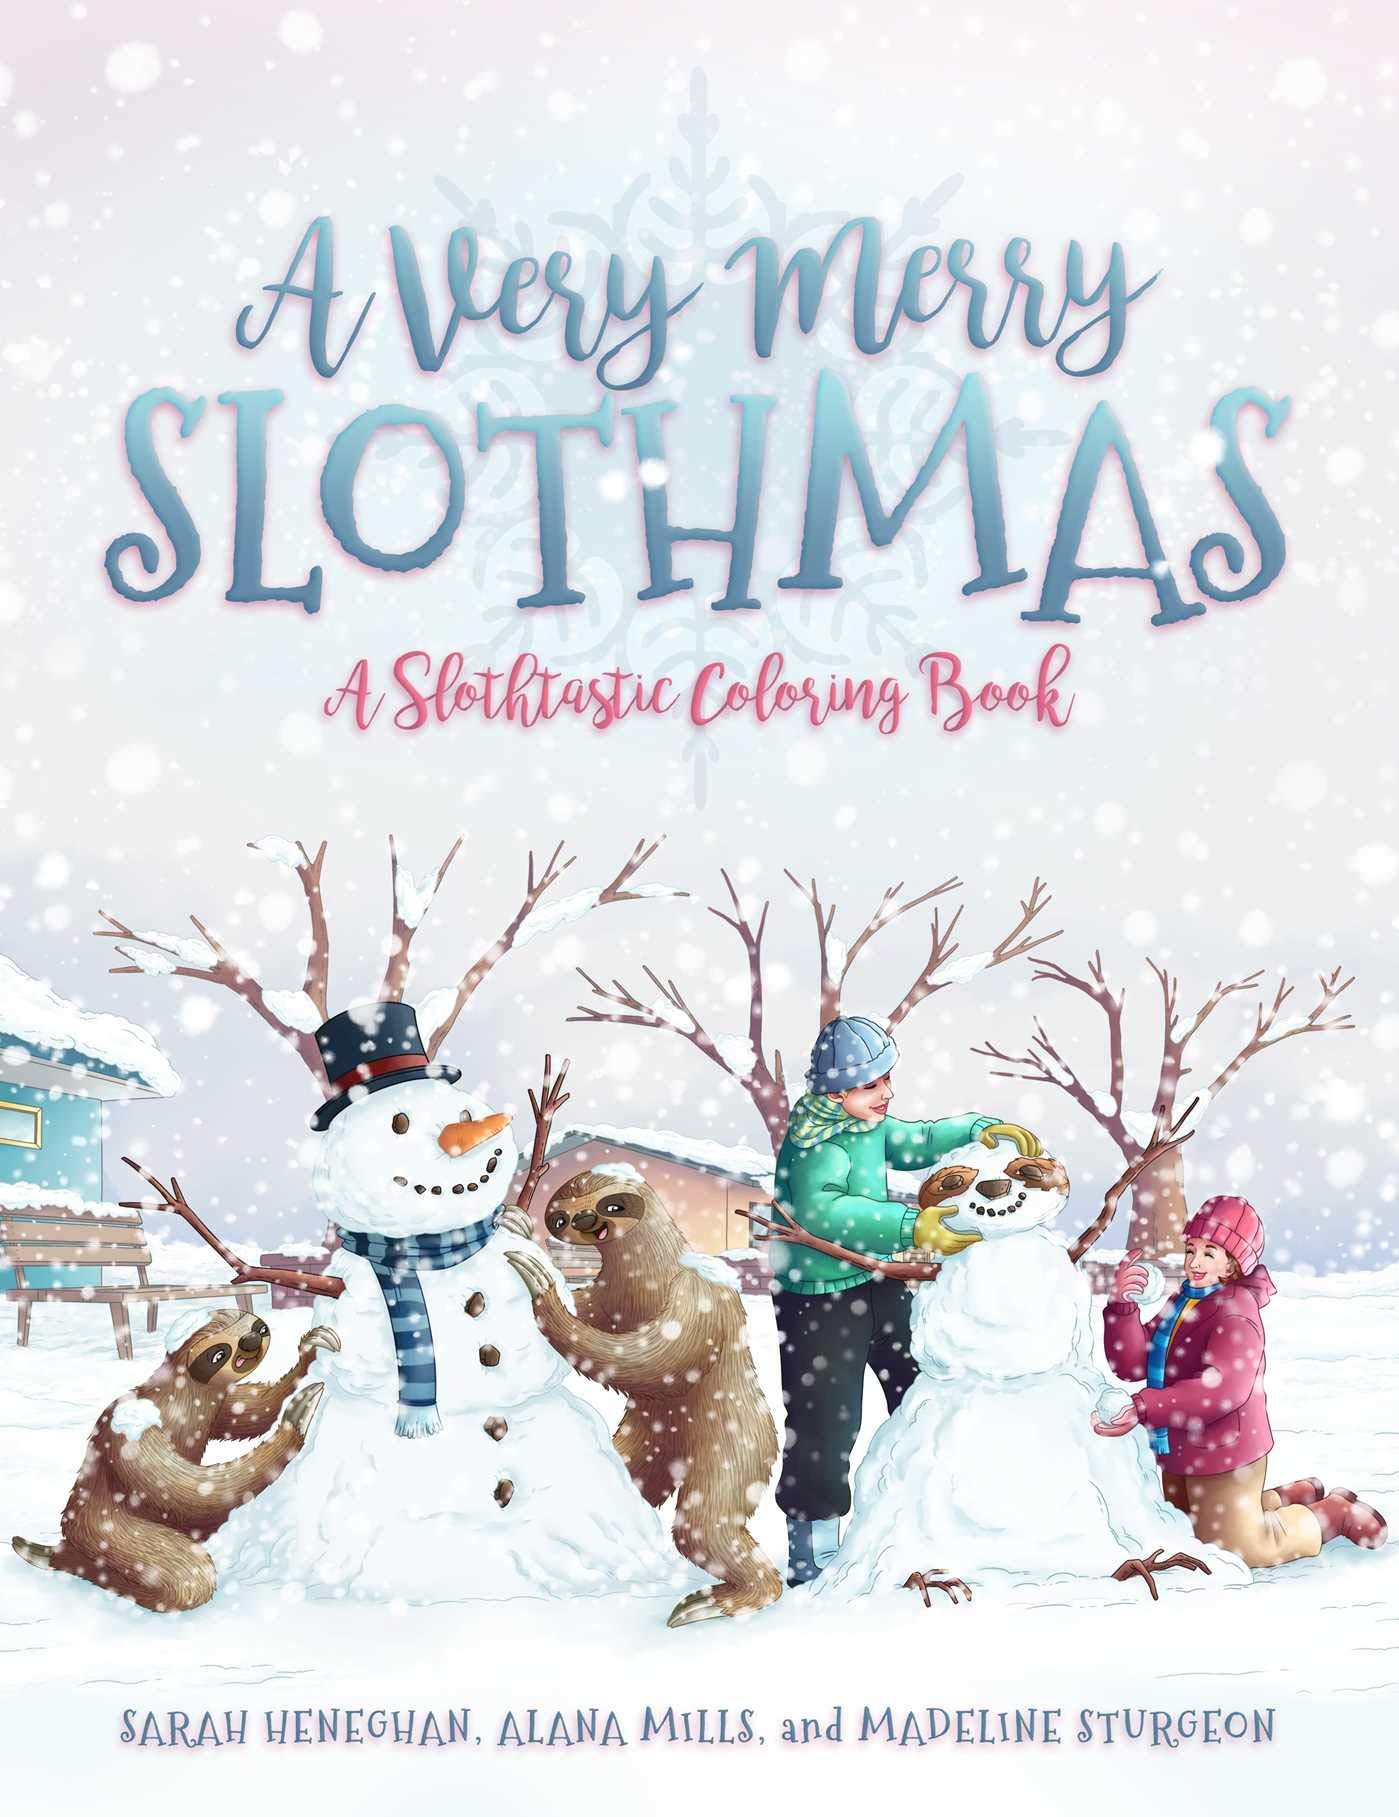 A Very Merry Slothmas: A Slothtastic Coloring Book - 9781682618172